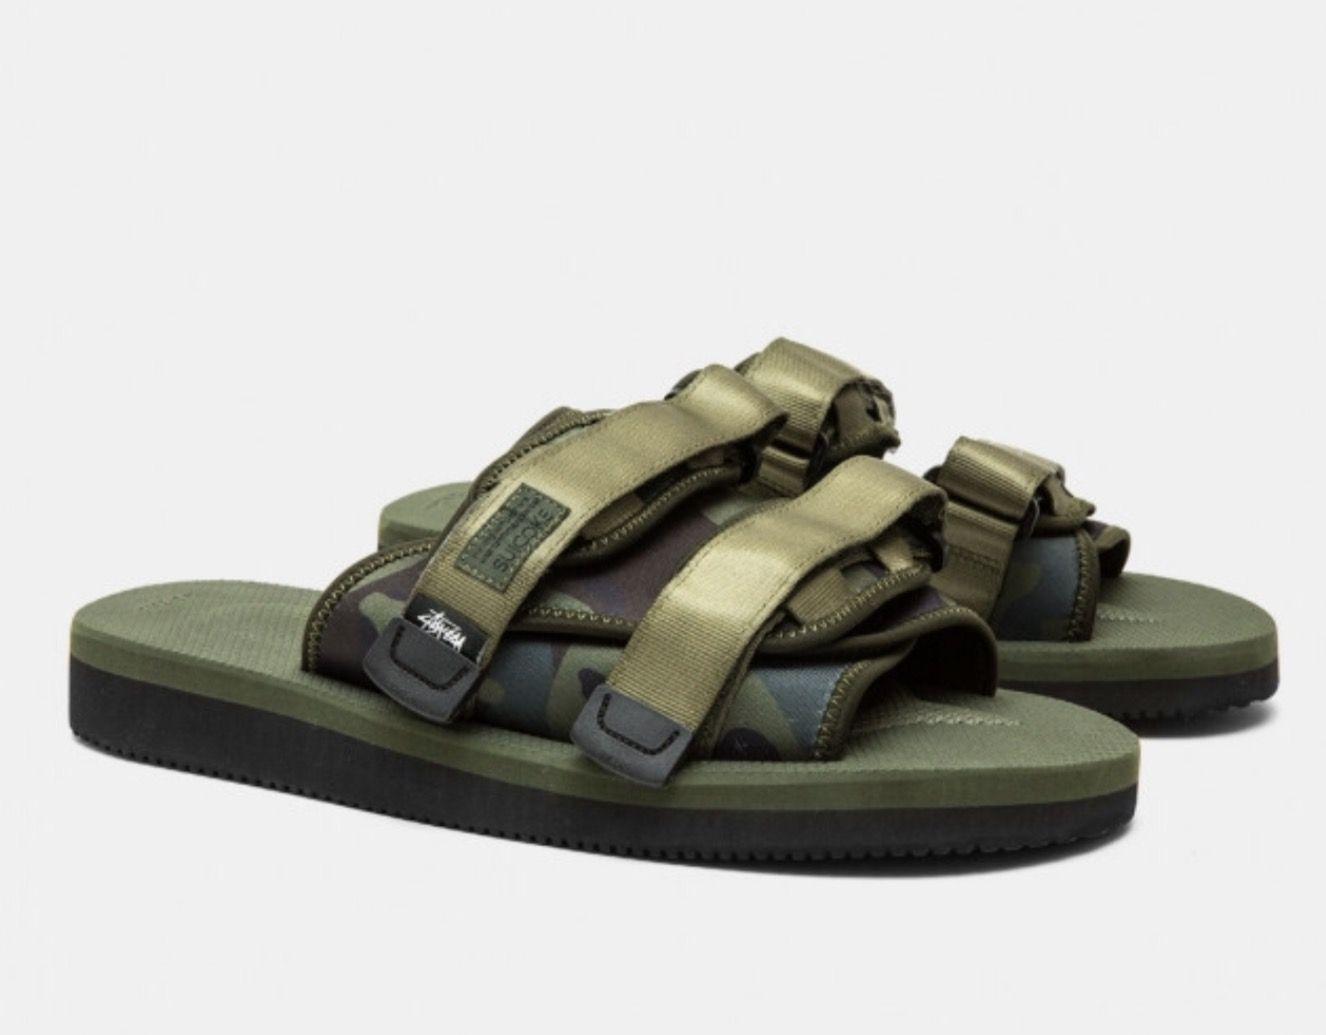 6f8389424f11 Stussy X Suicoke Moto sandals